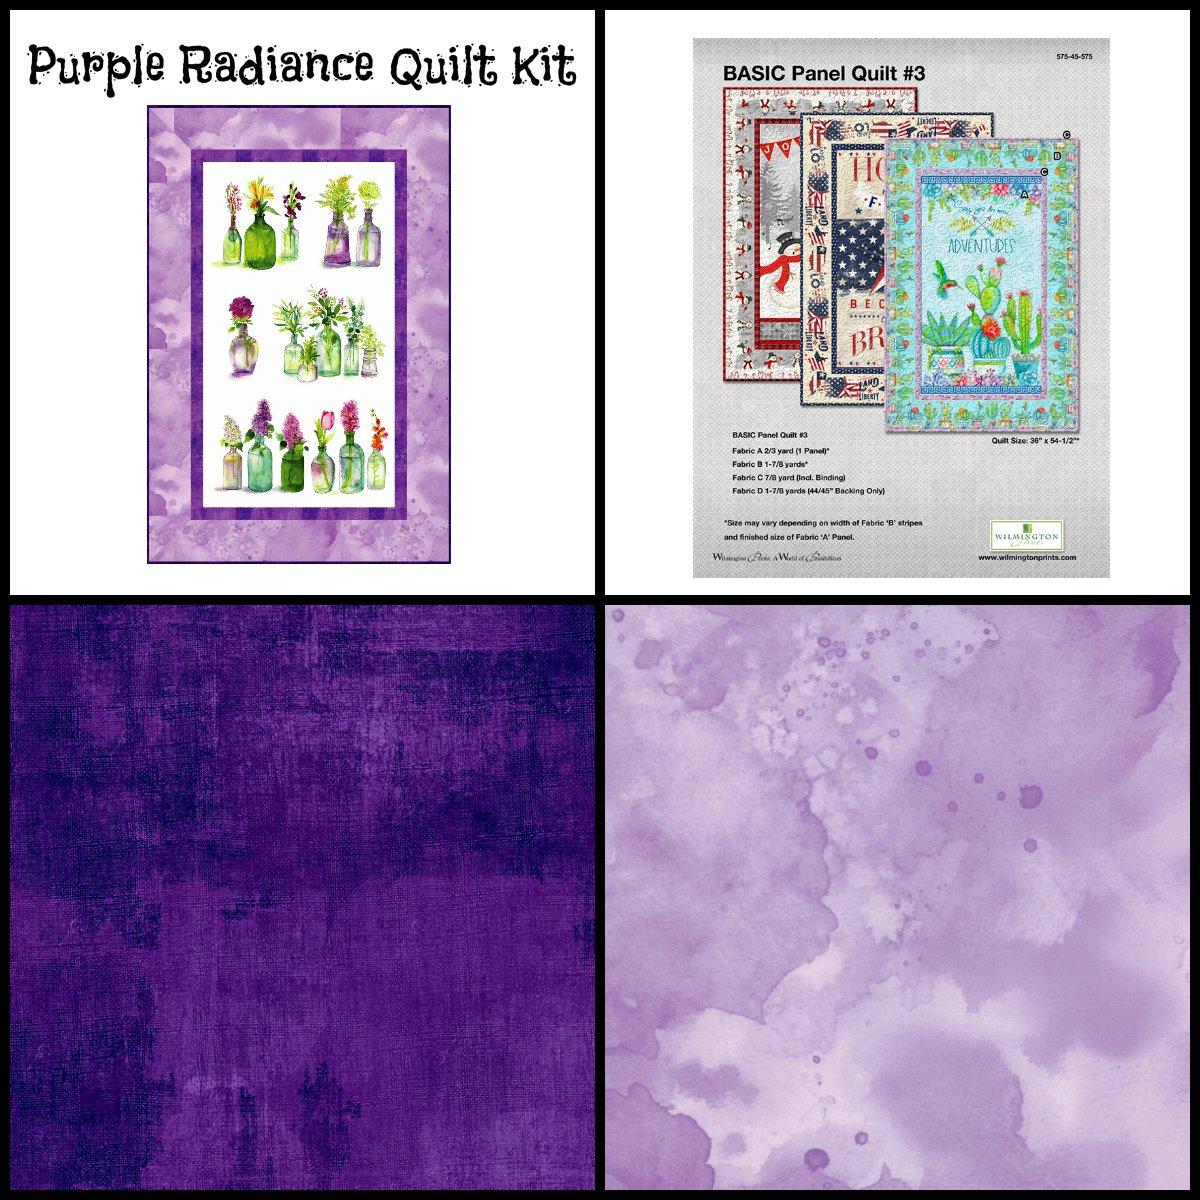 Purple Radiance Quilt Kit (35 x 53.5)